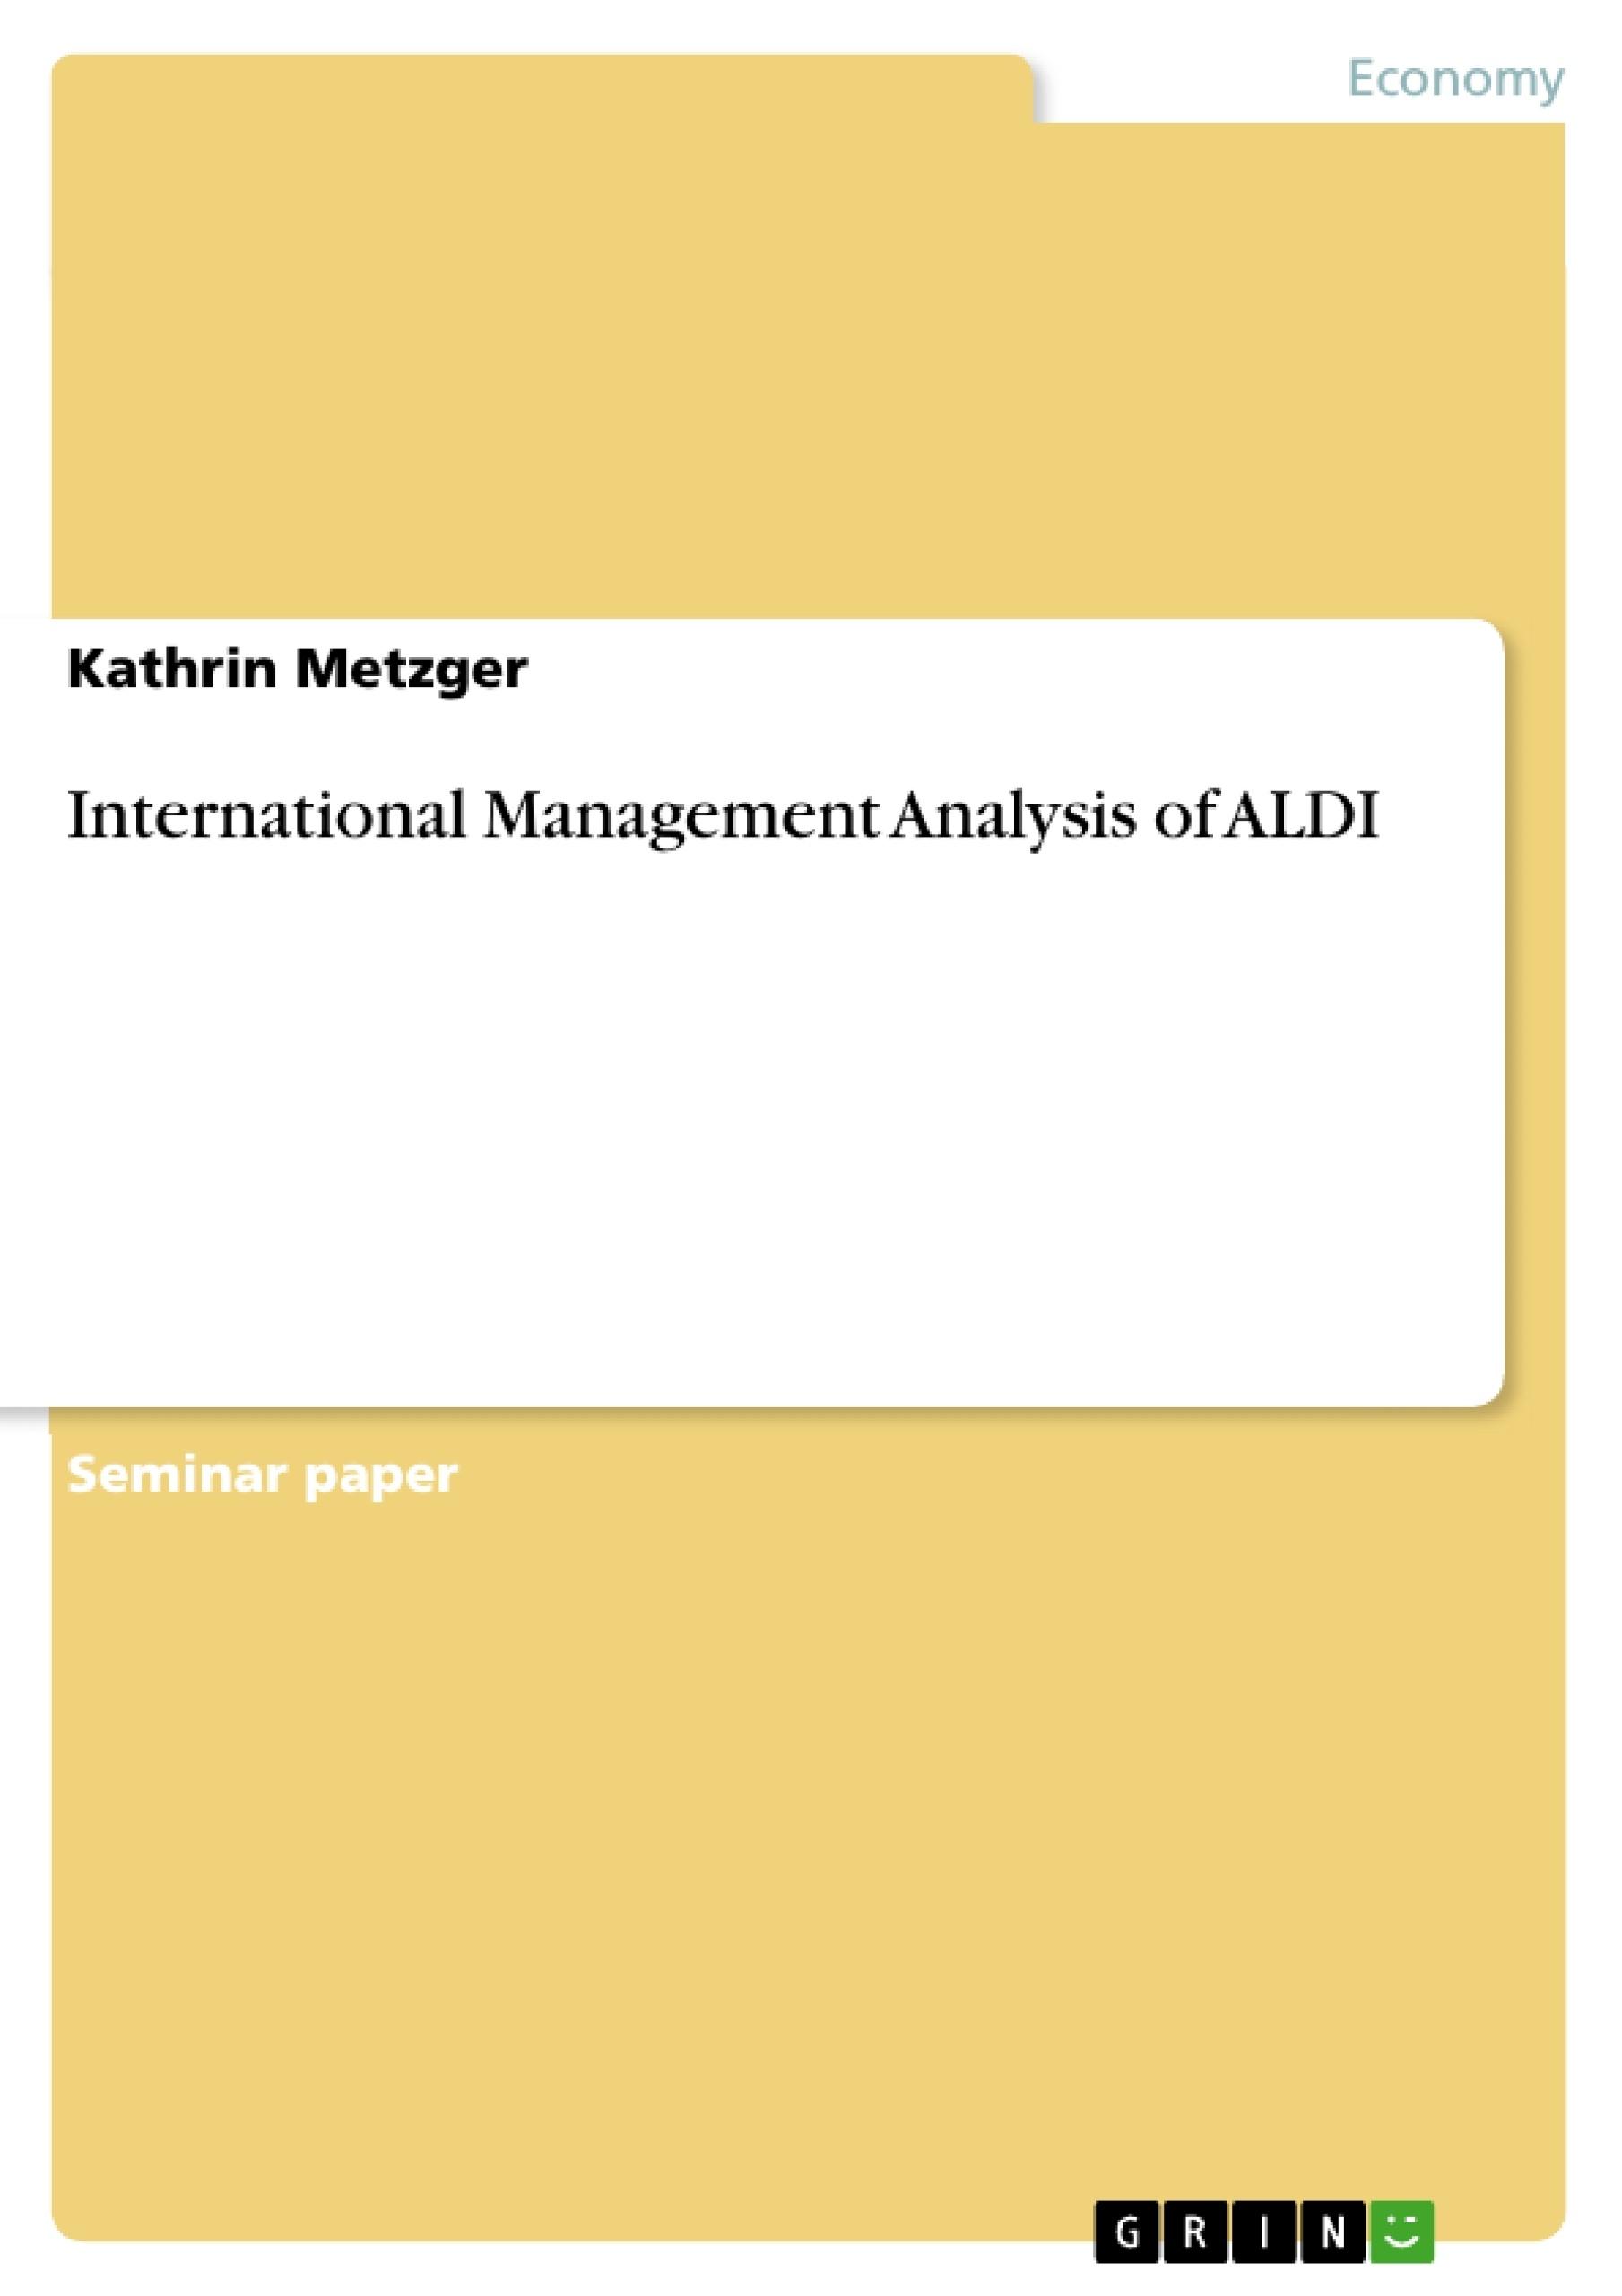 Title: International Management Analysis of ALDI